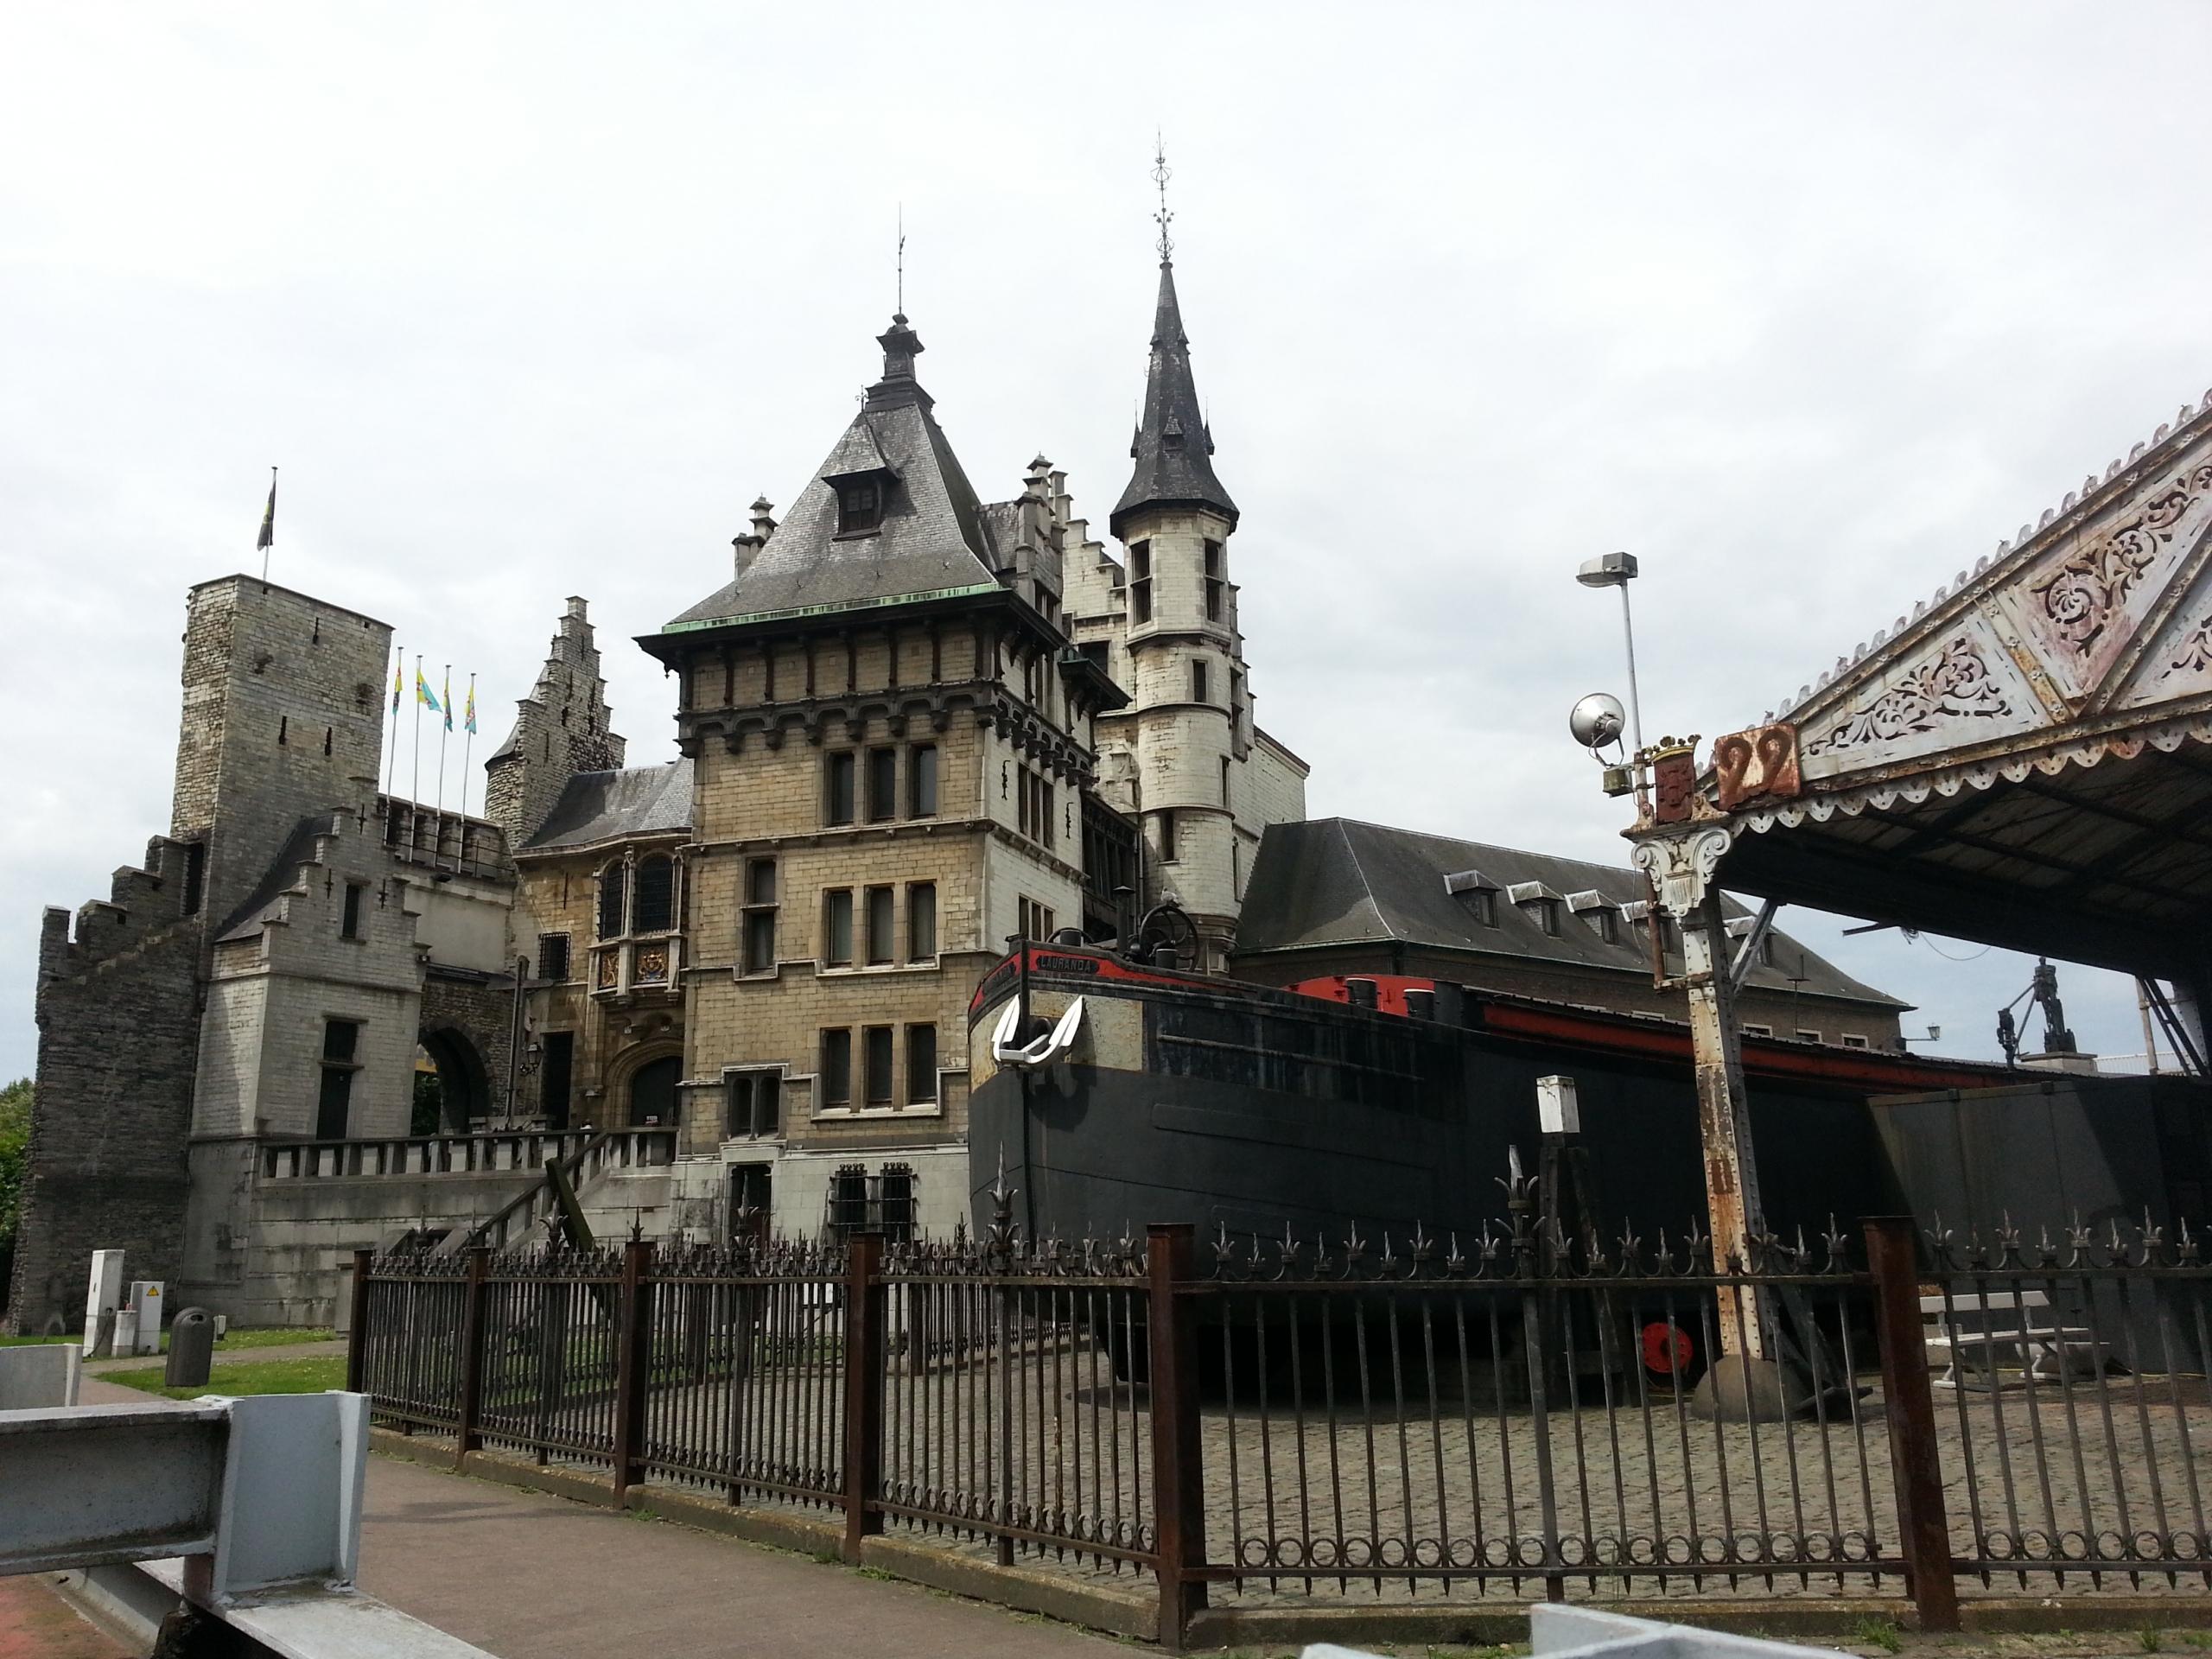 Antwerpen_Gebaeude-scaled